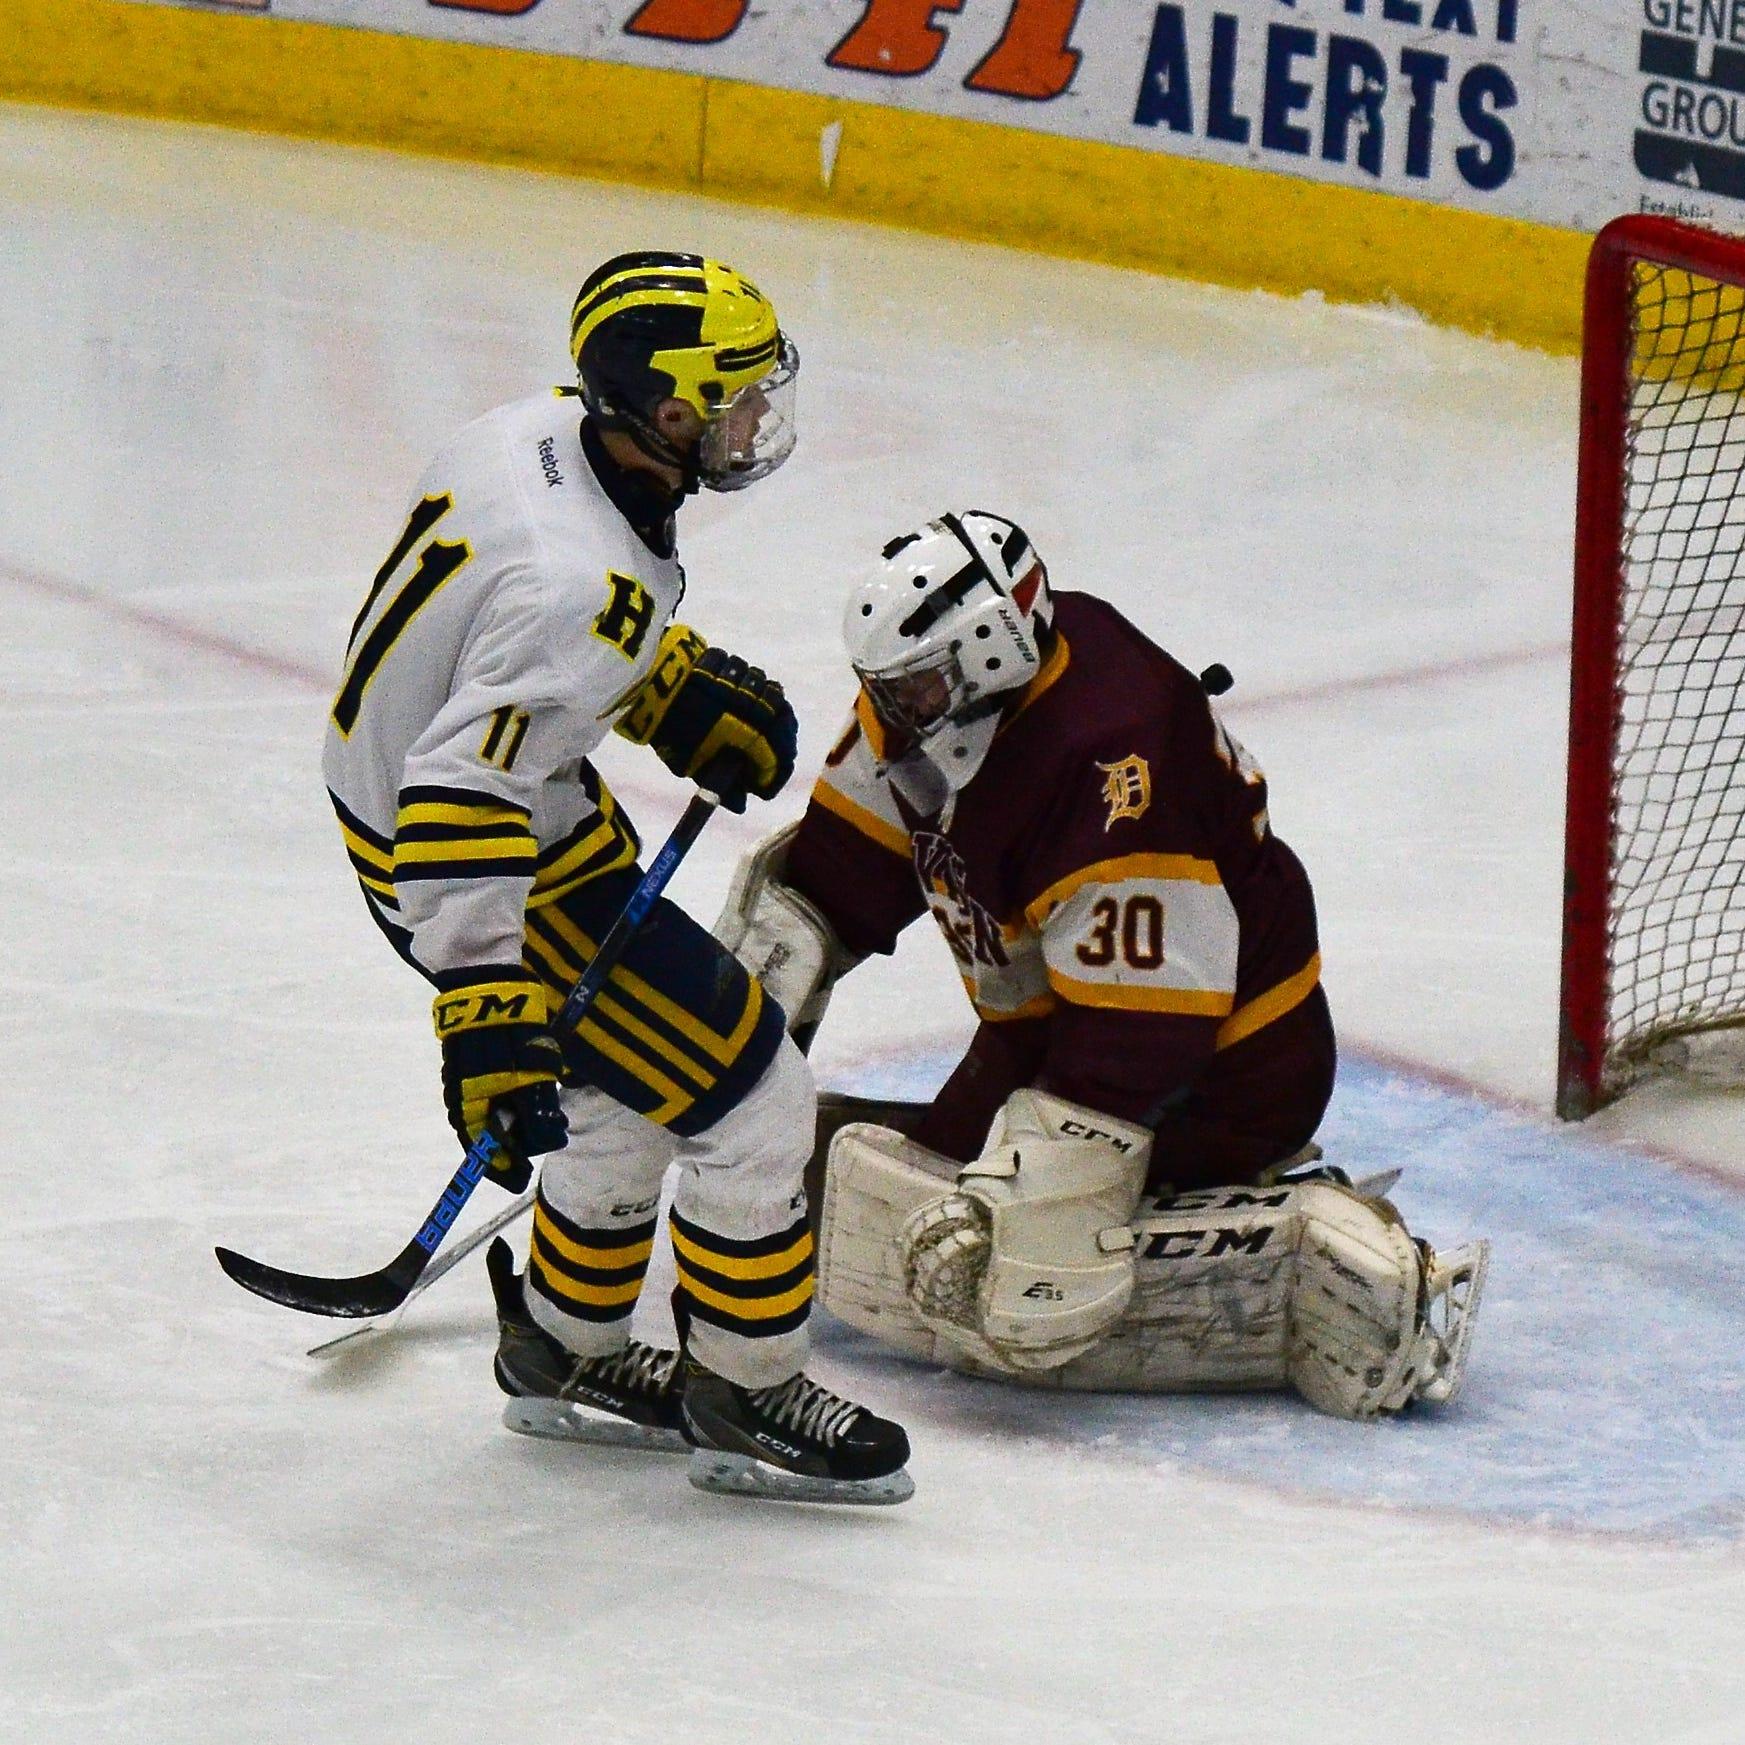 Hartland romps to regional hockey title; Howell falls to Livonia Stevenson